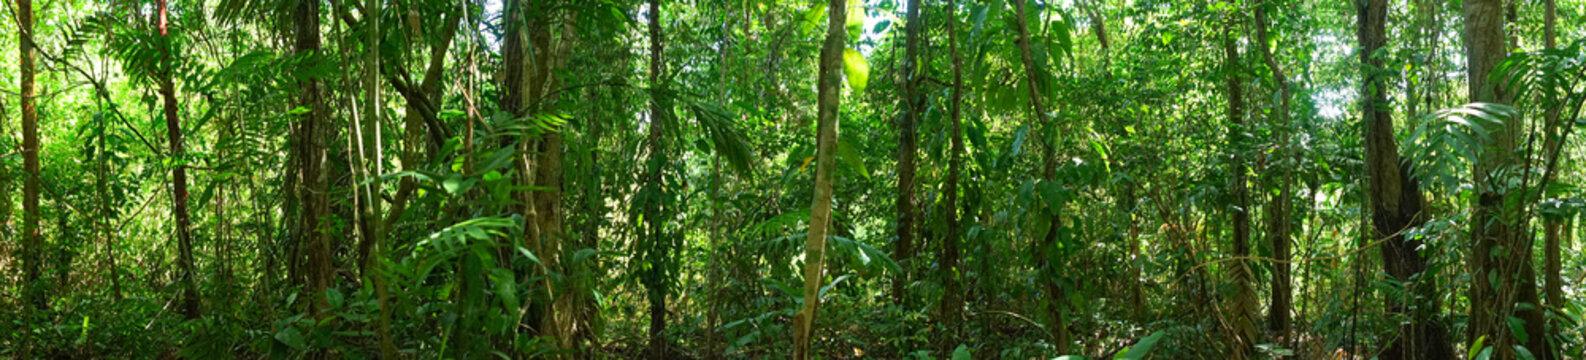 Panoramic Jungle Picture